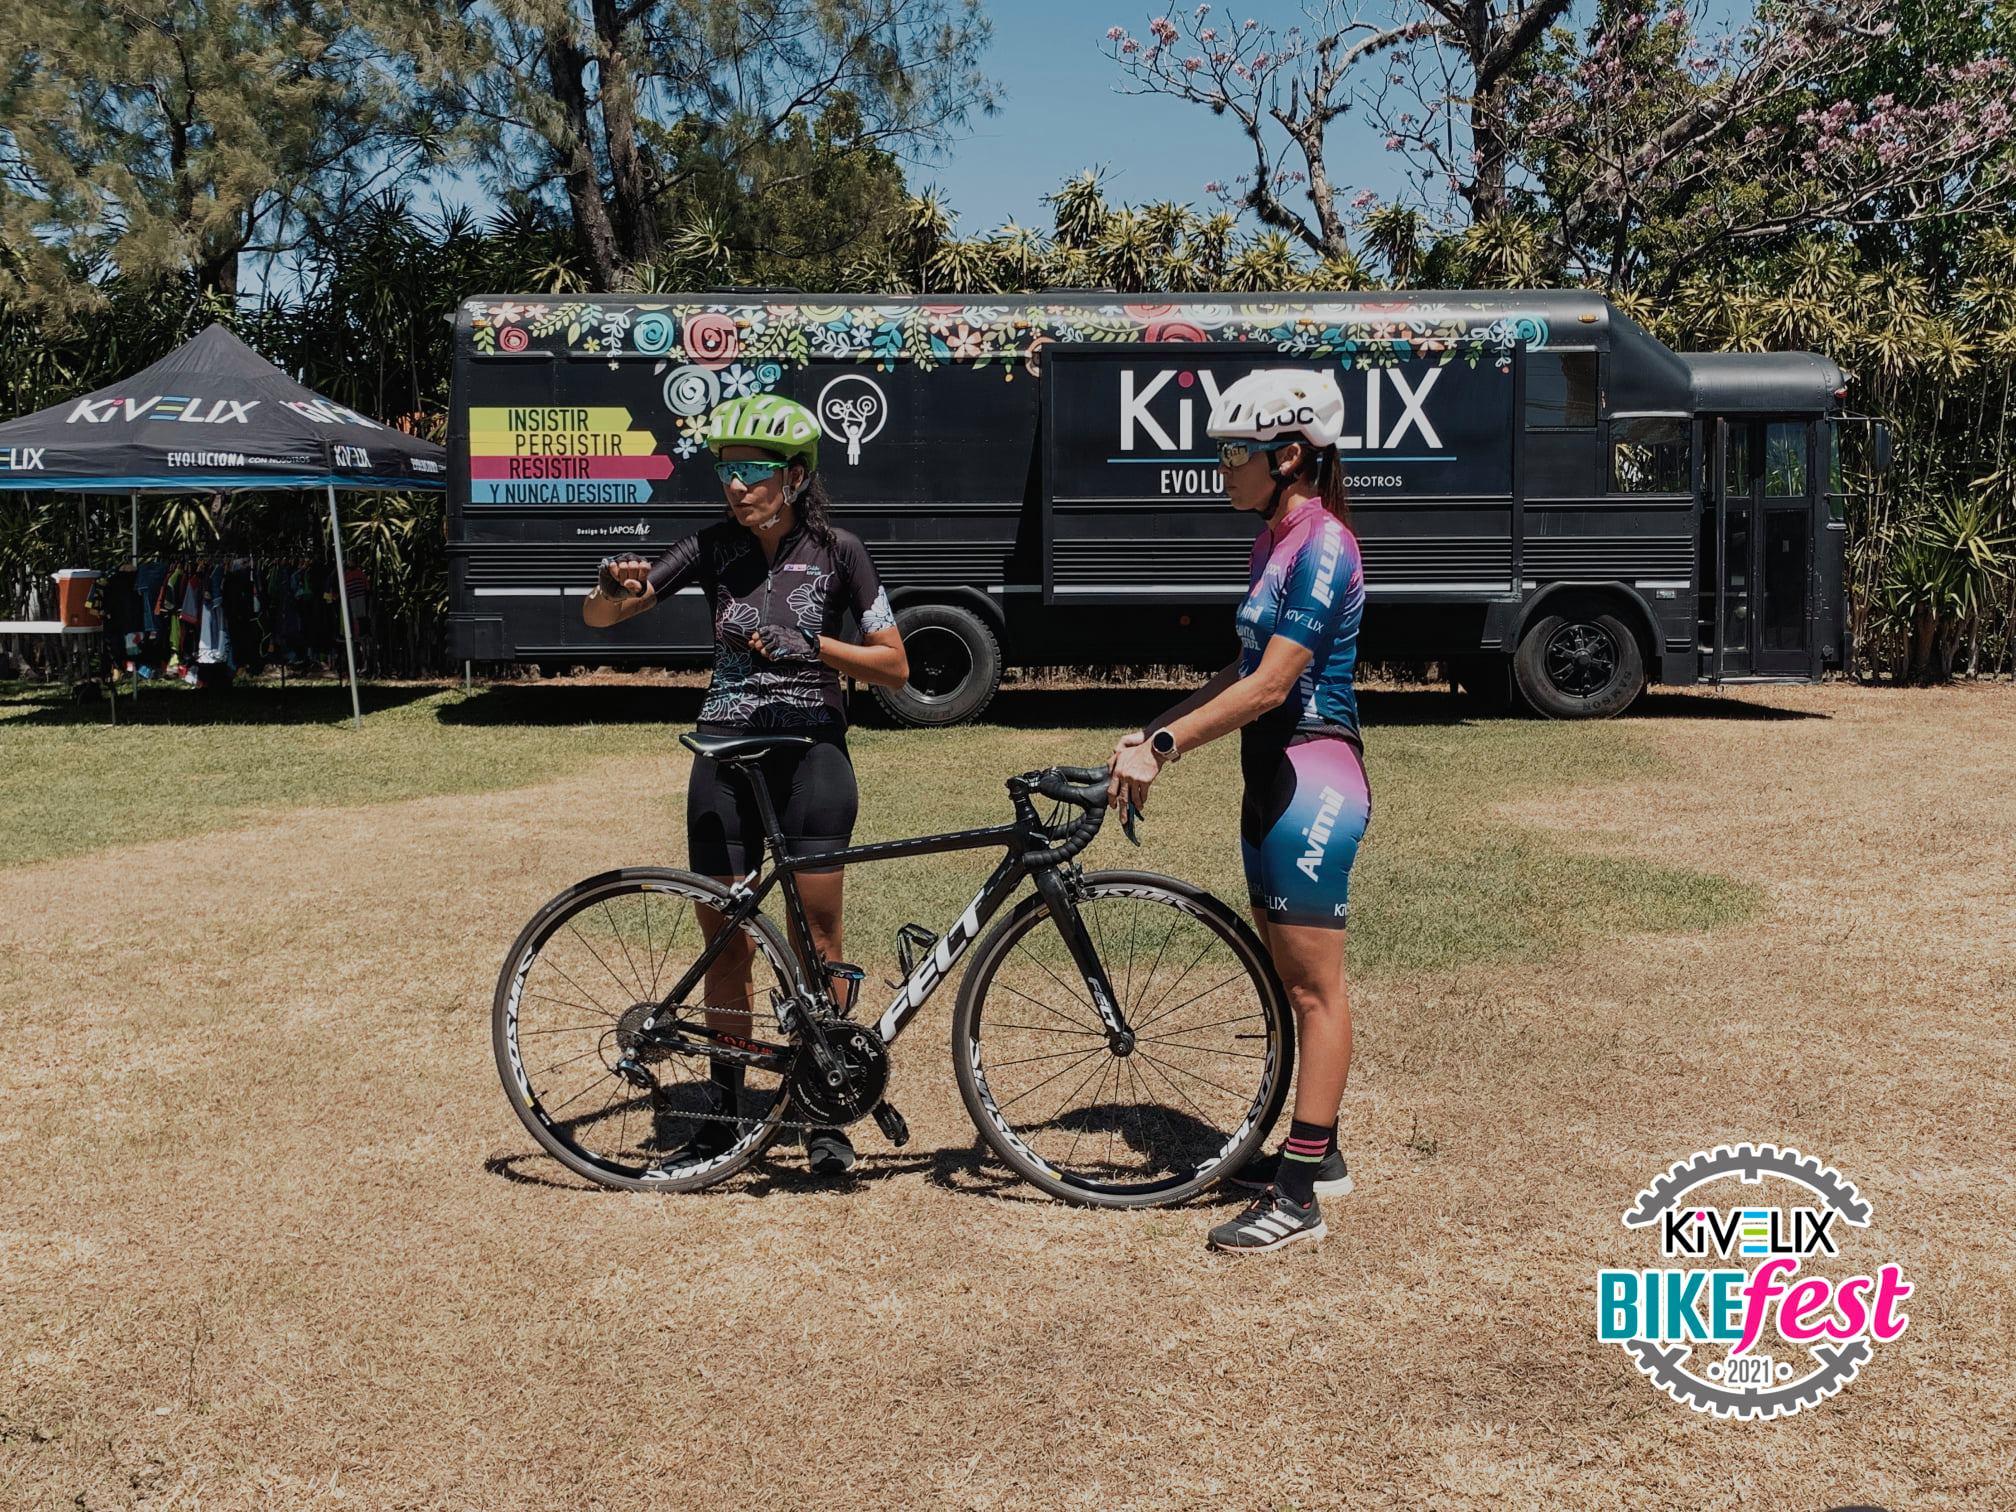 Kivelix Trophy: primer evento de MTB por etapas exclusivo para mujeres